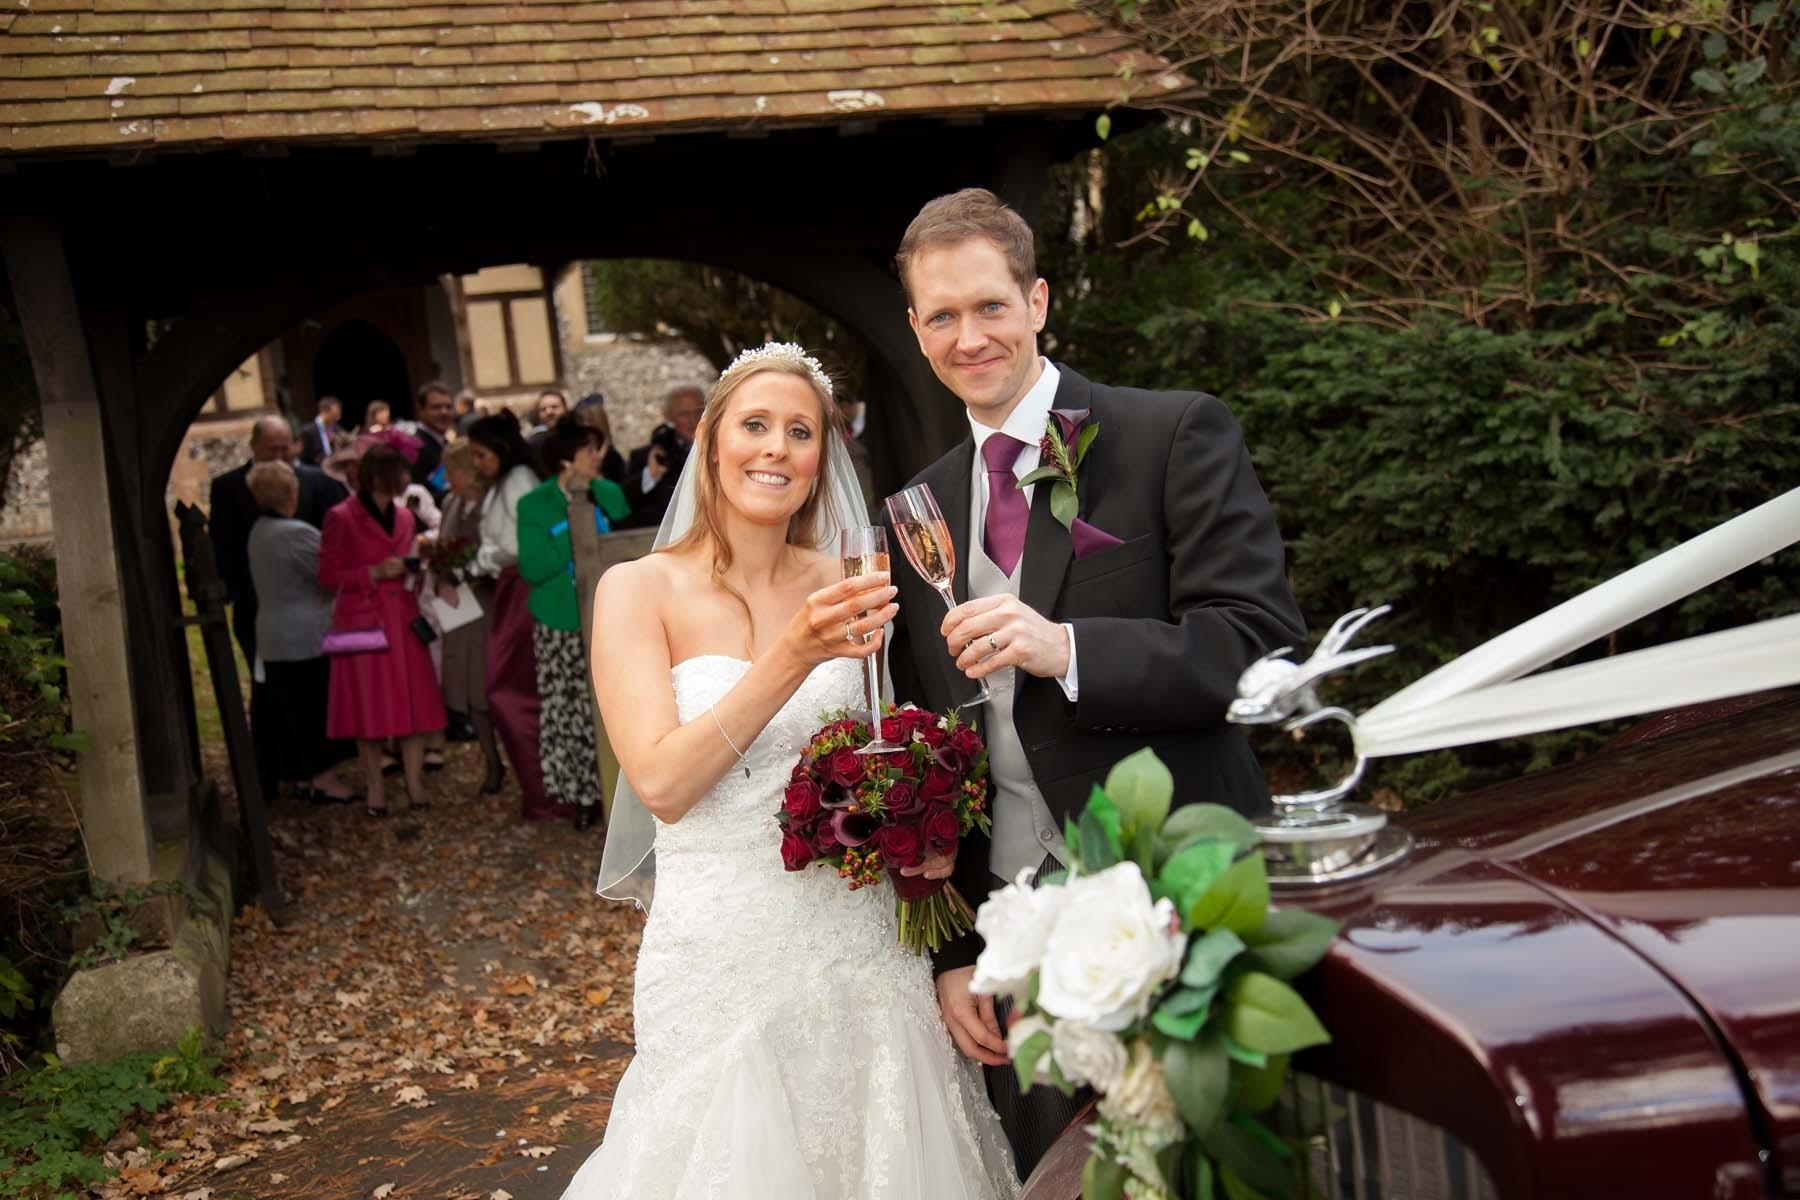 Sussex & Surrey Wedding Photographer - Ceremony (13)